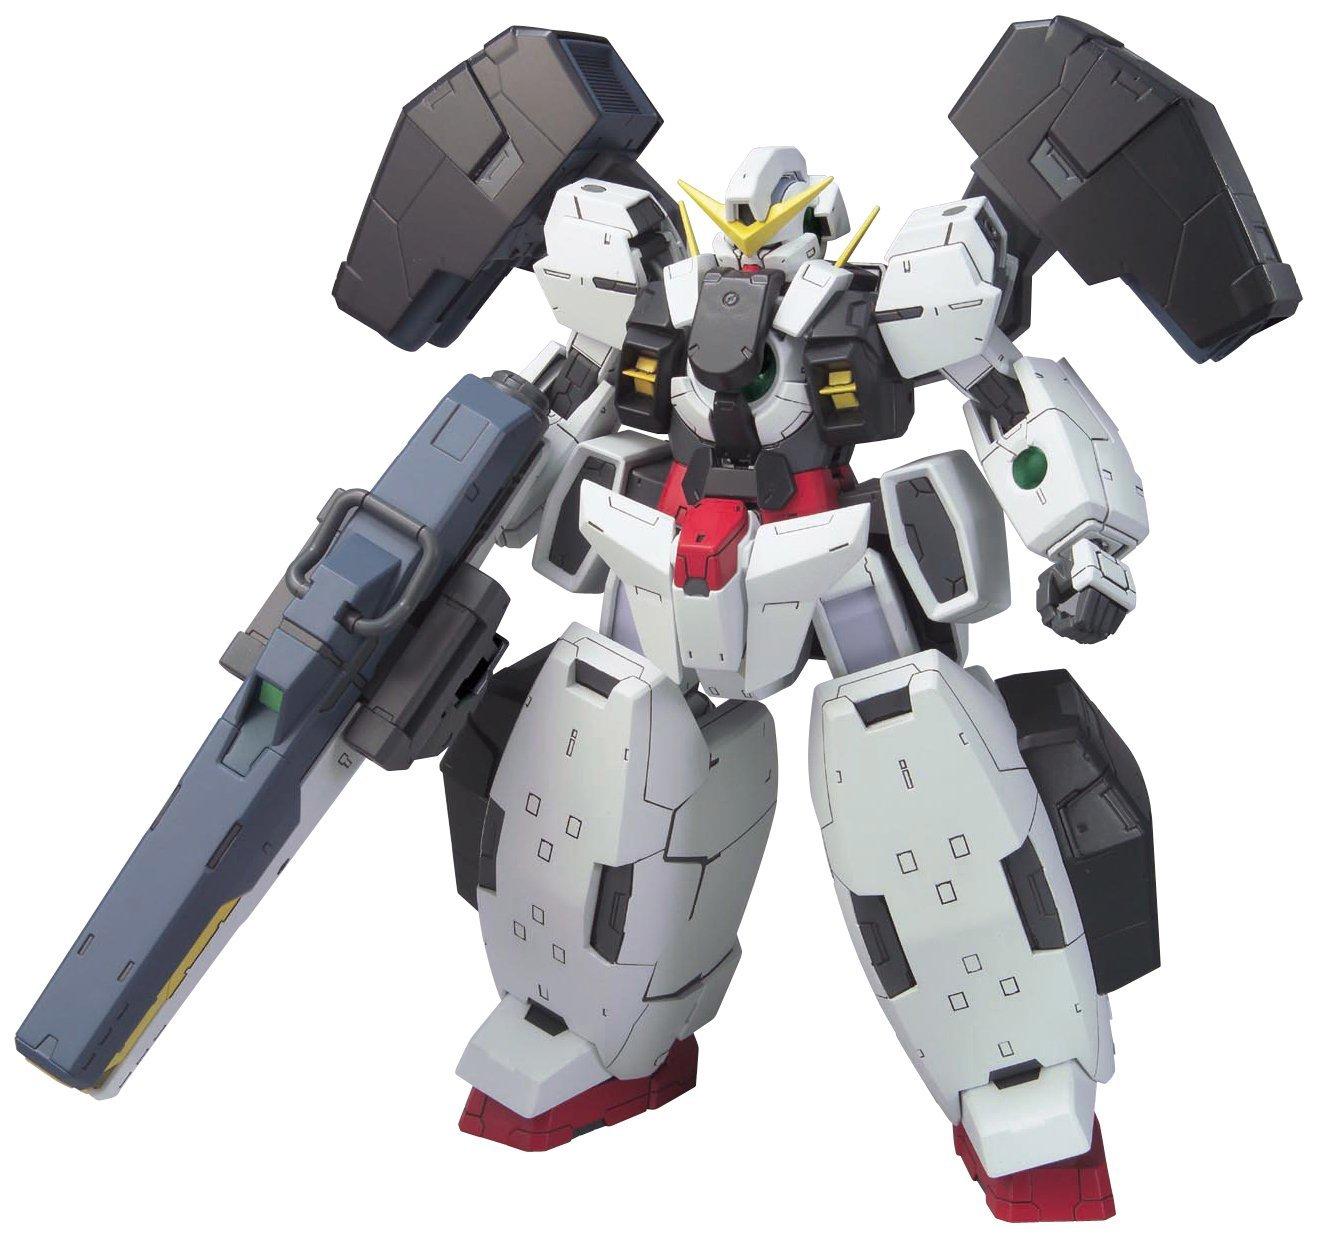 GN-005 Virtue Gundam GUNPLA 00 Gundam 1/100